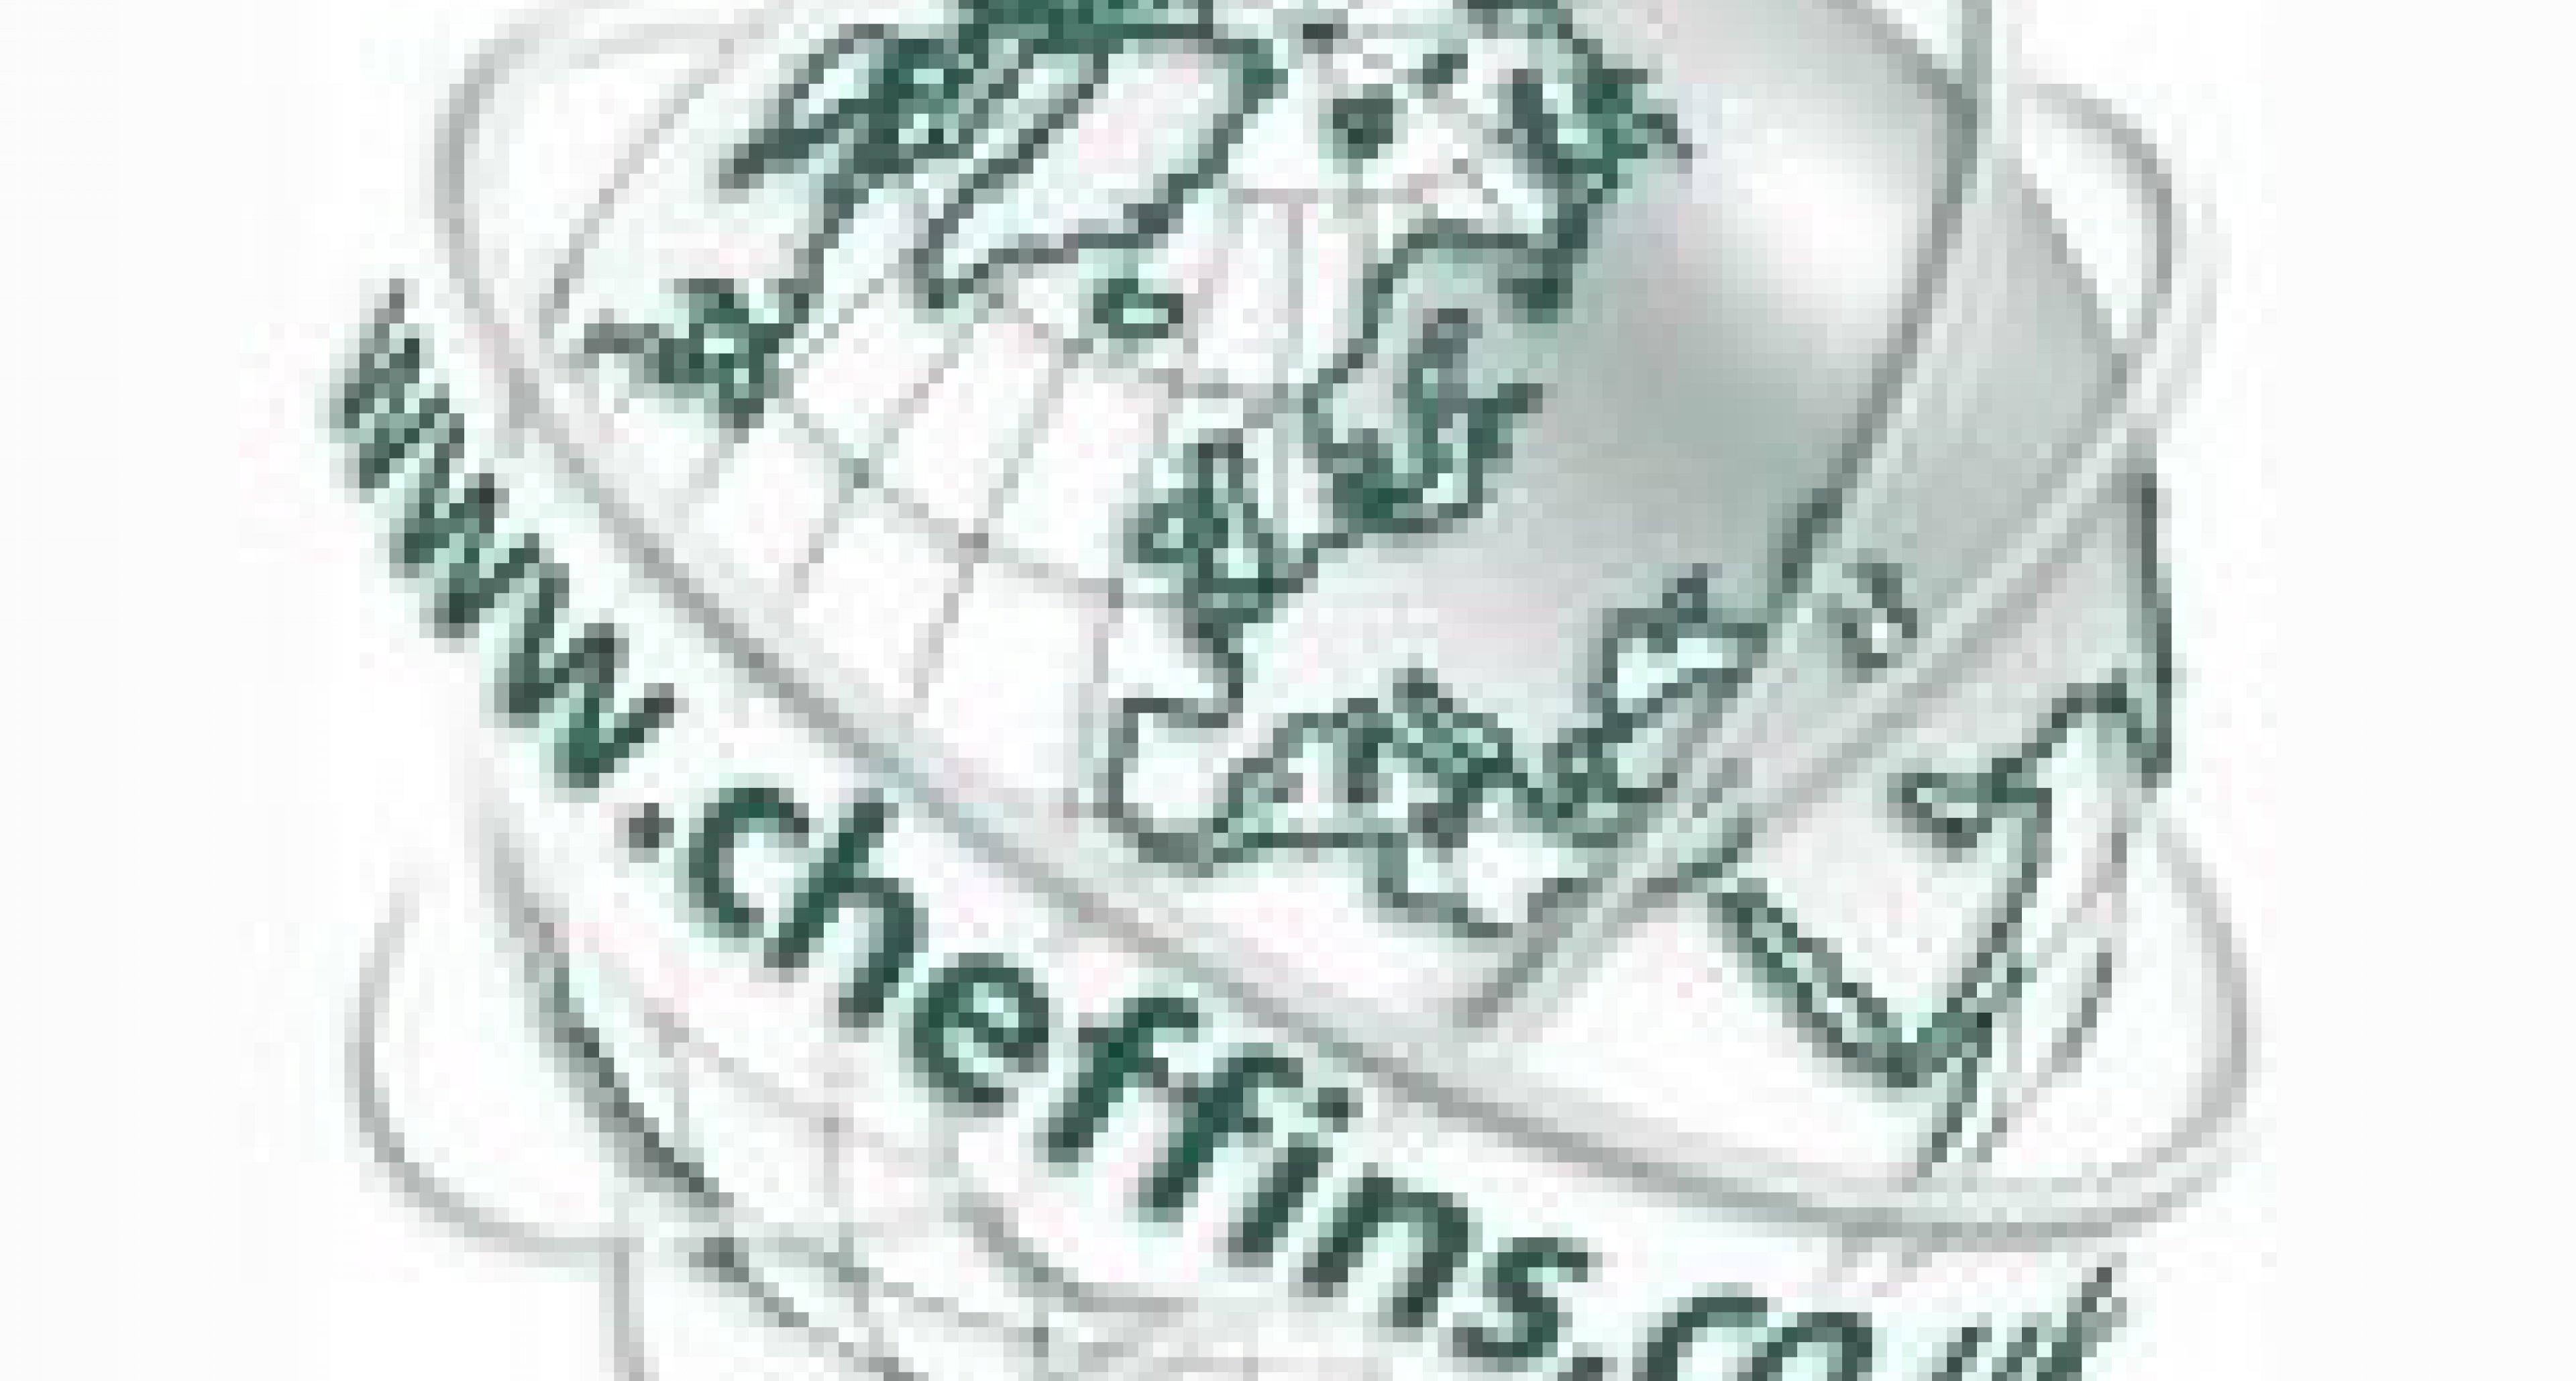 21st September 2002 – Cheffins at Shuttleworth House, Biggleswade